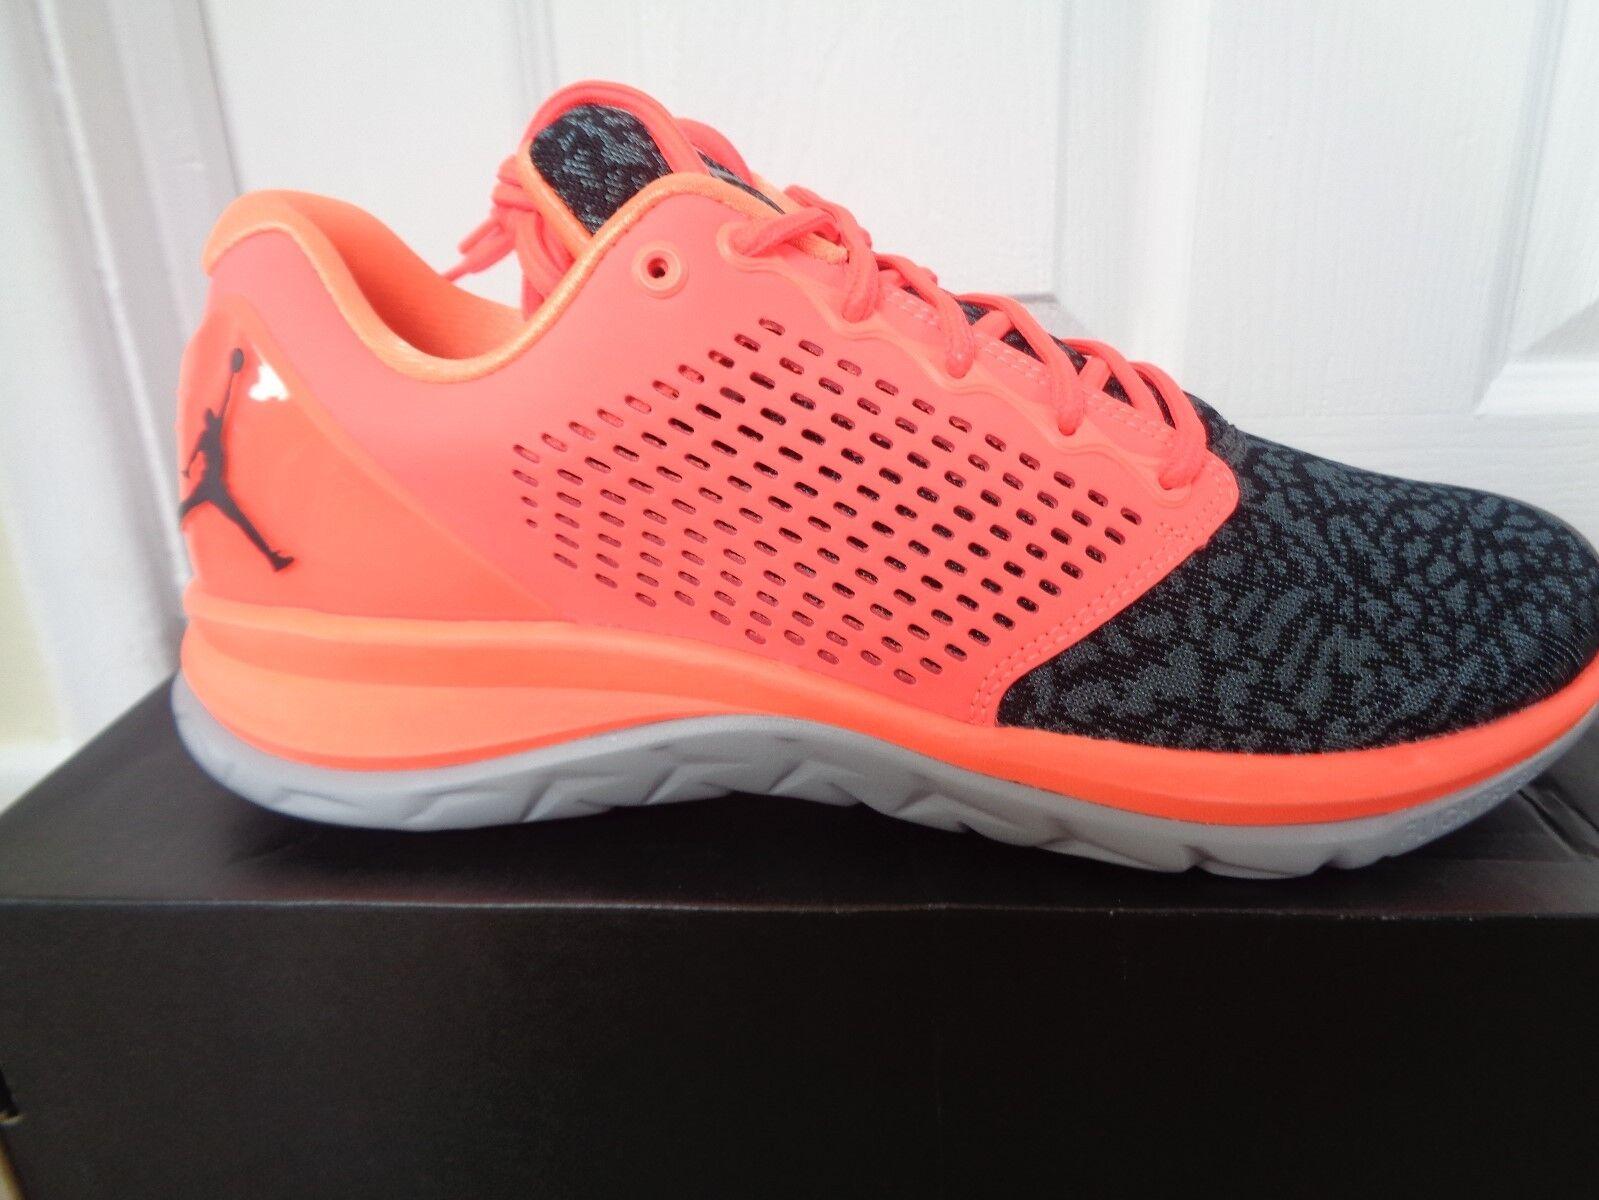 Brand discount Nike Jordan Trainer ST trainers sneakers 820253  803 eu 44 us 10 NEW+BOX